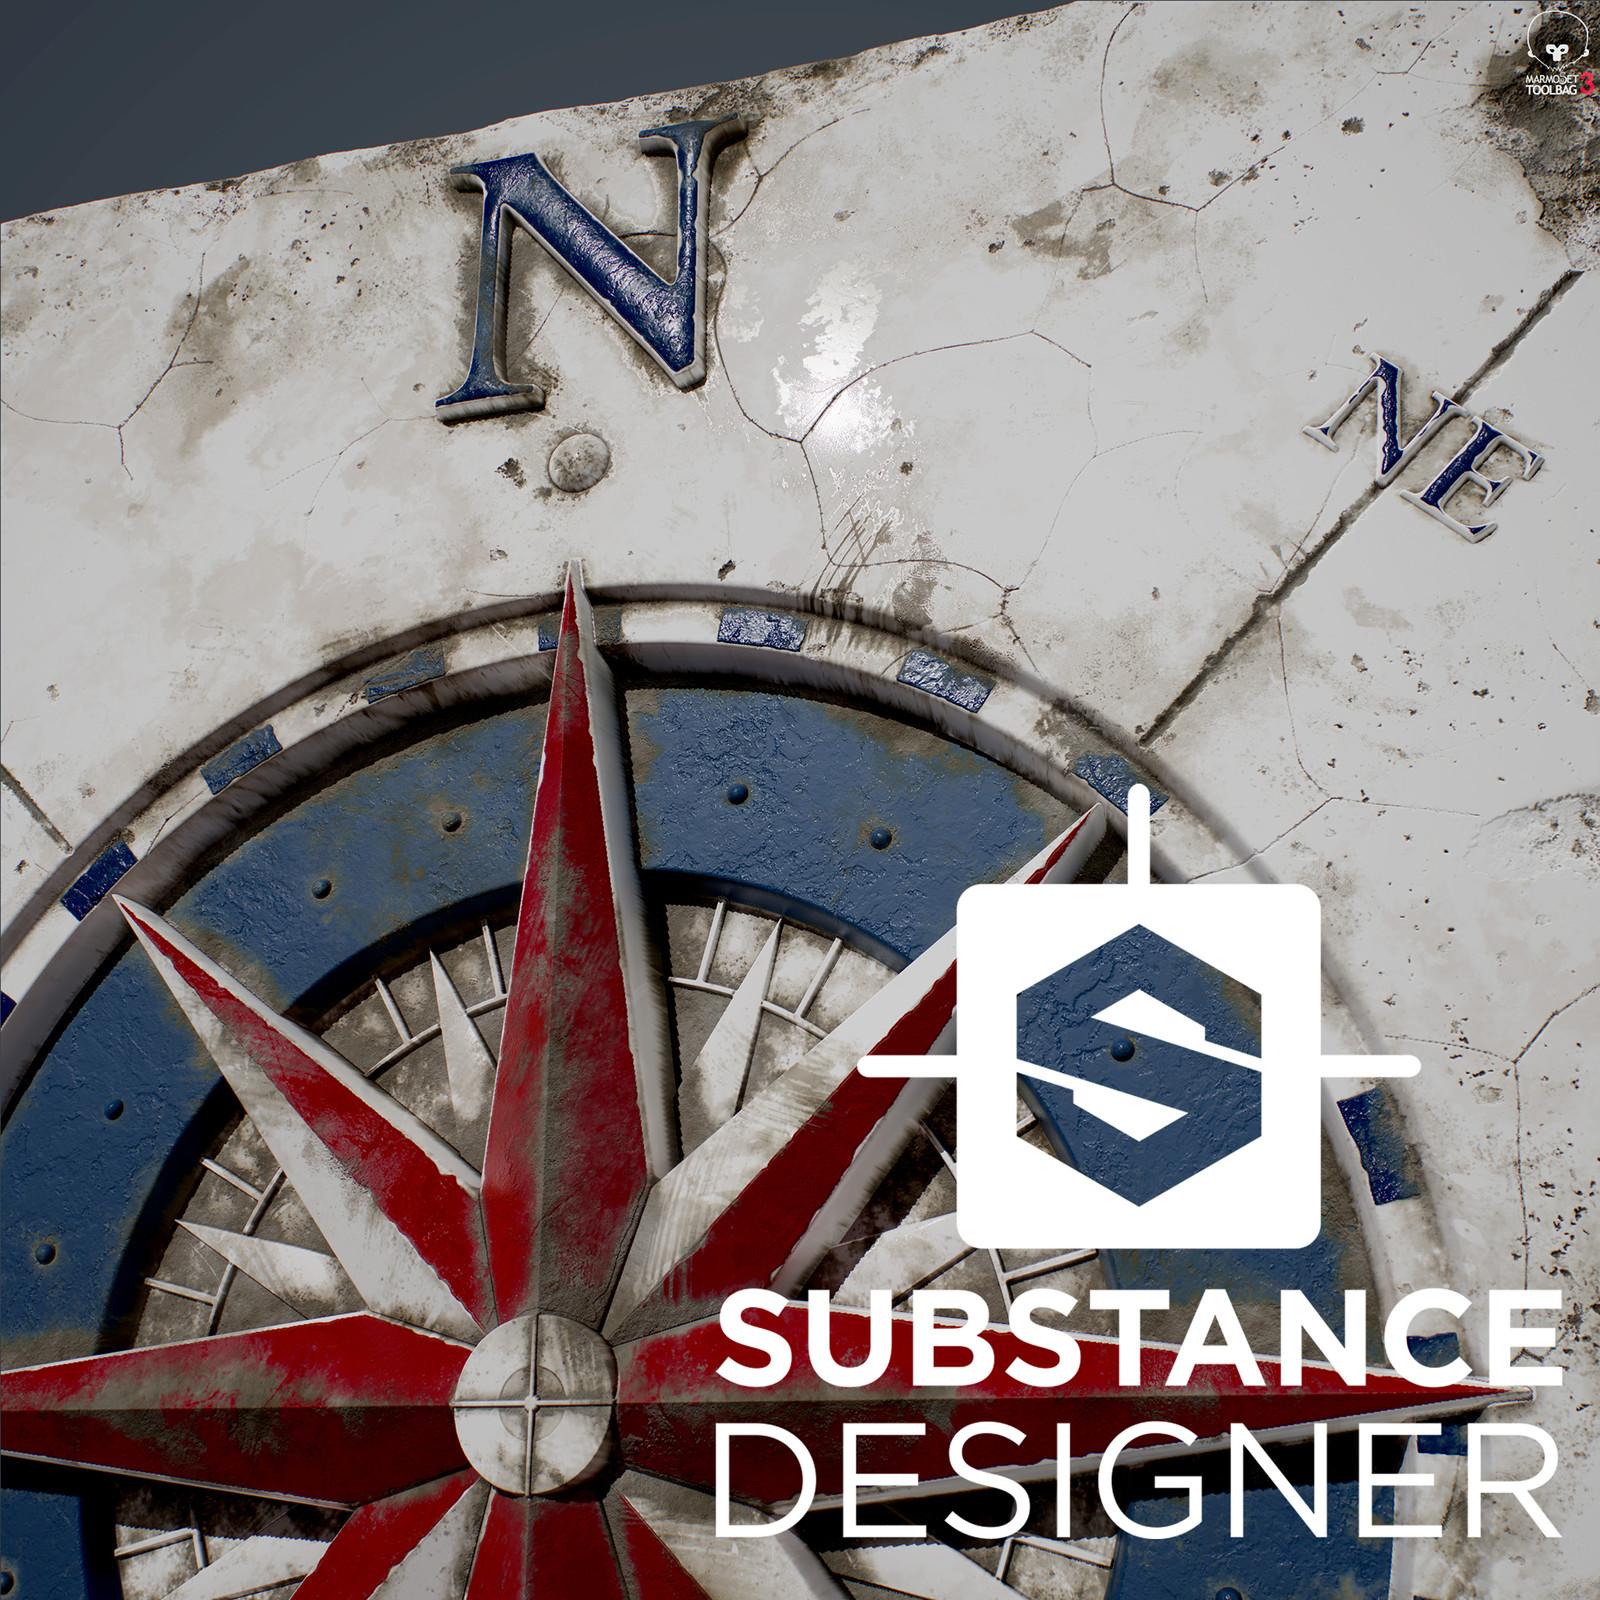 The Compass Rose - 100% procedural, Substance Designer